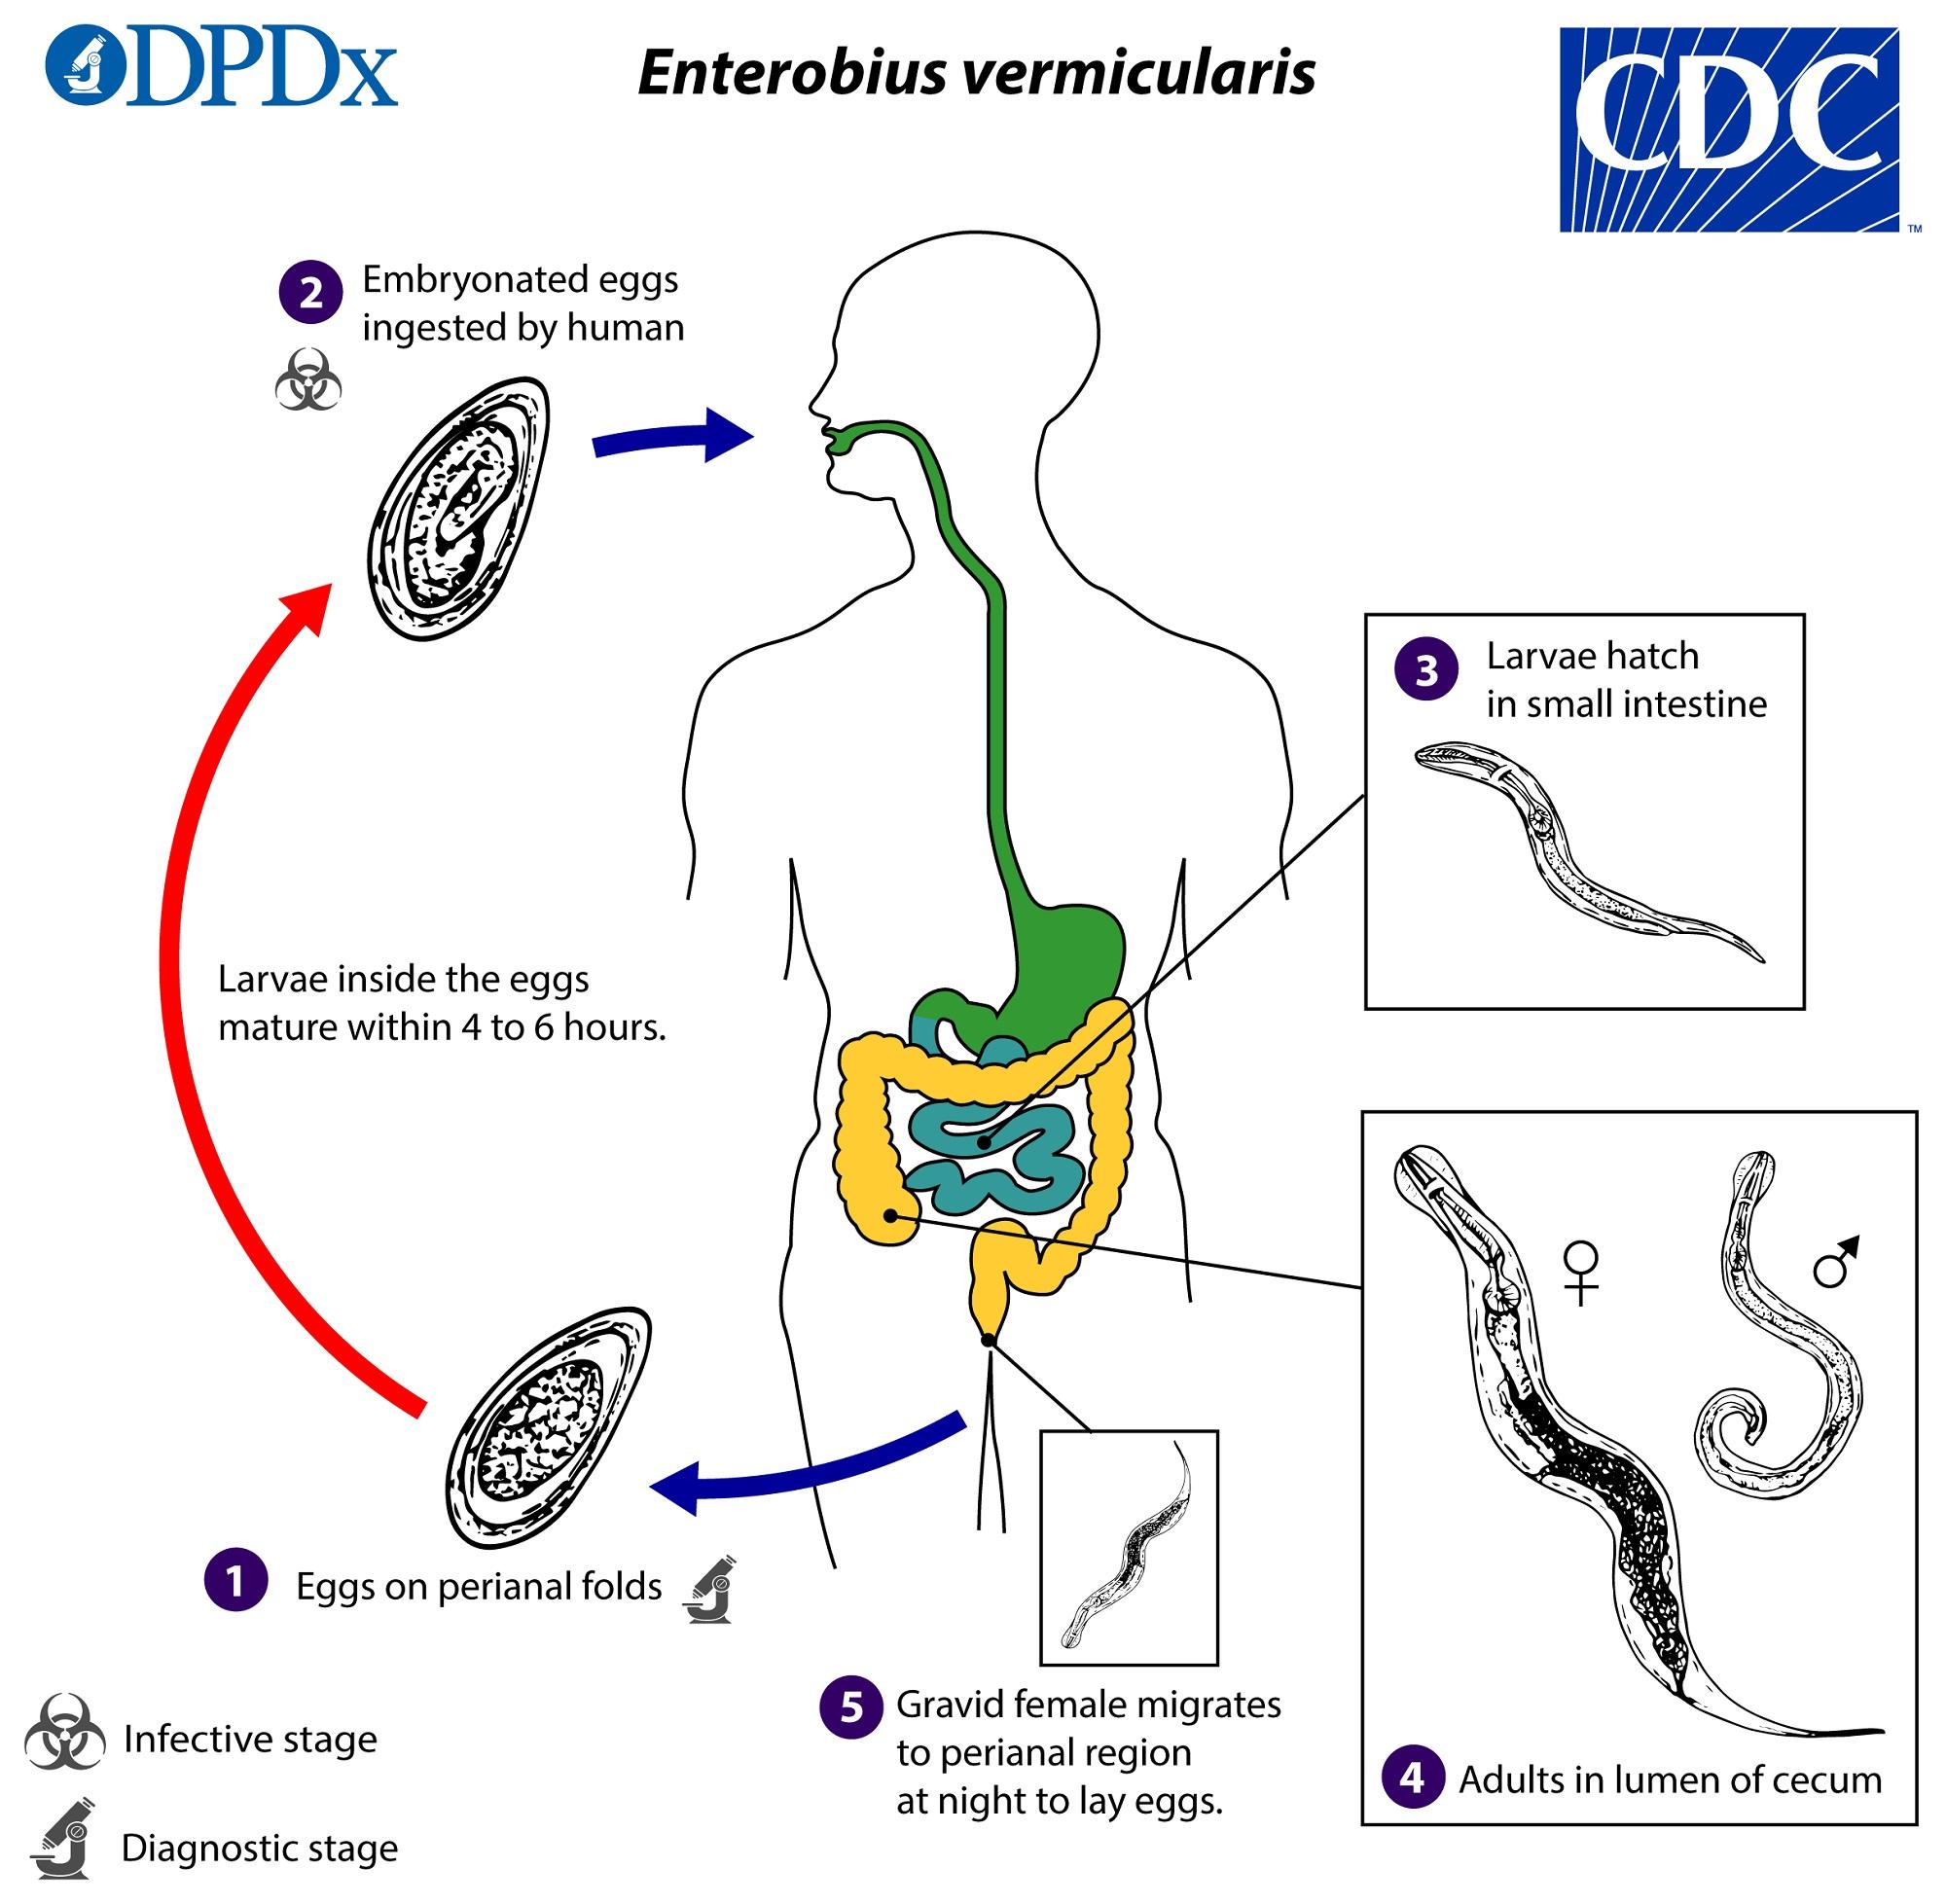 enterobius vermicularis larvae morphology vaccino papilloma virus adulti emilia romagna